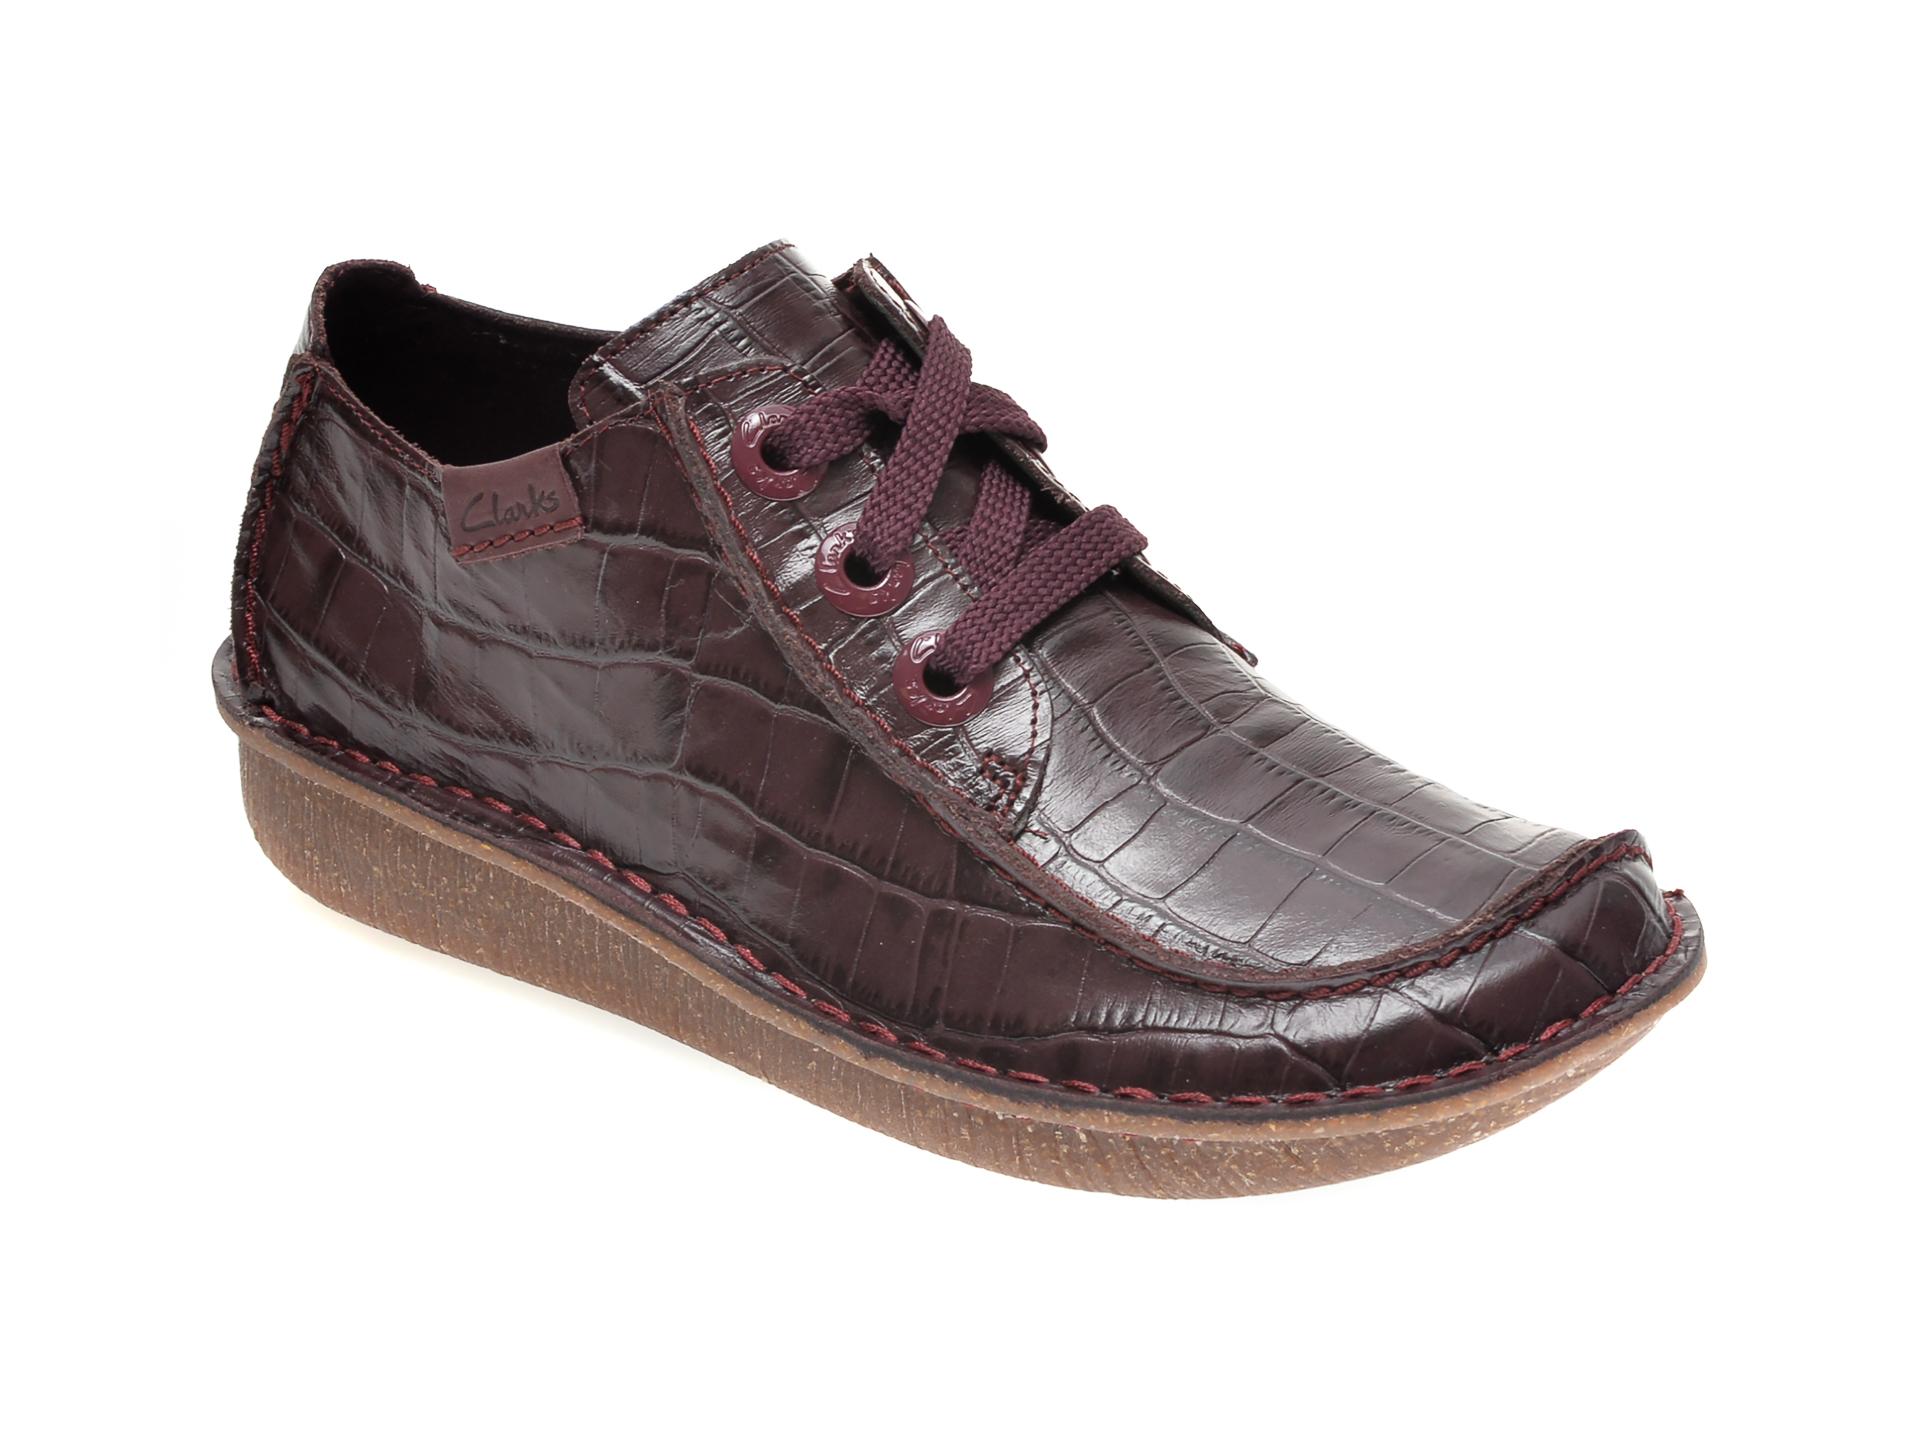 Pantofi CLARKS visinii, FUNNY DREAM, din piele naturala imagine